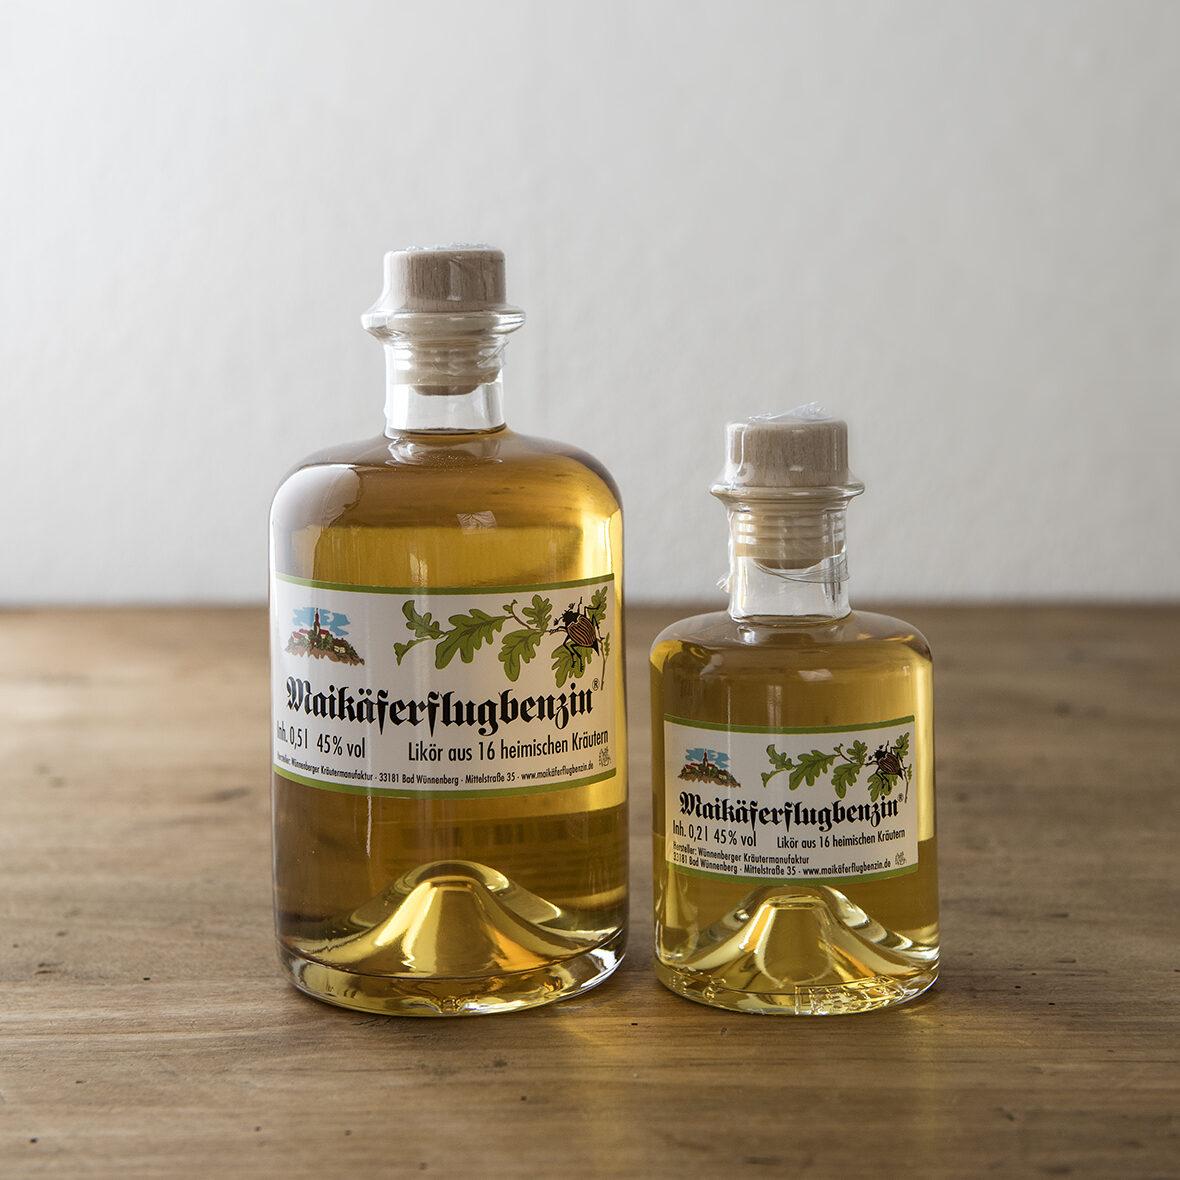 Hövels Original – Fanartikel Maikaeferflugbenzin/Likör kaufen (Hausbrauerei Dortmund)